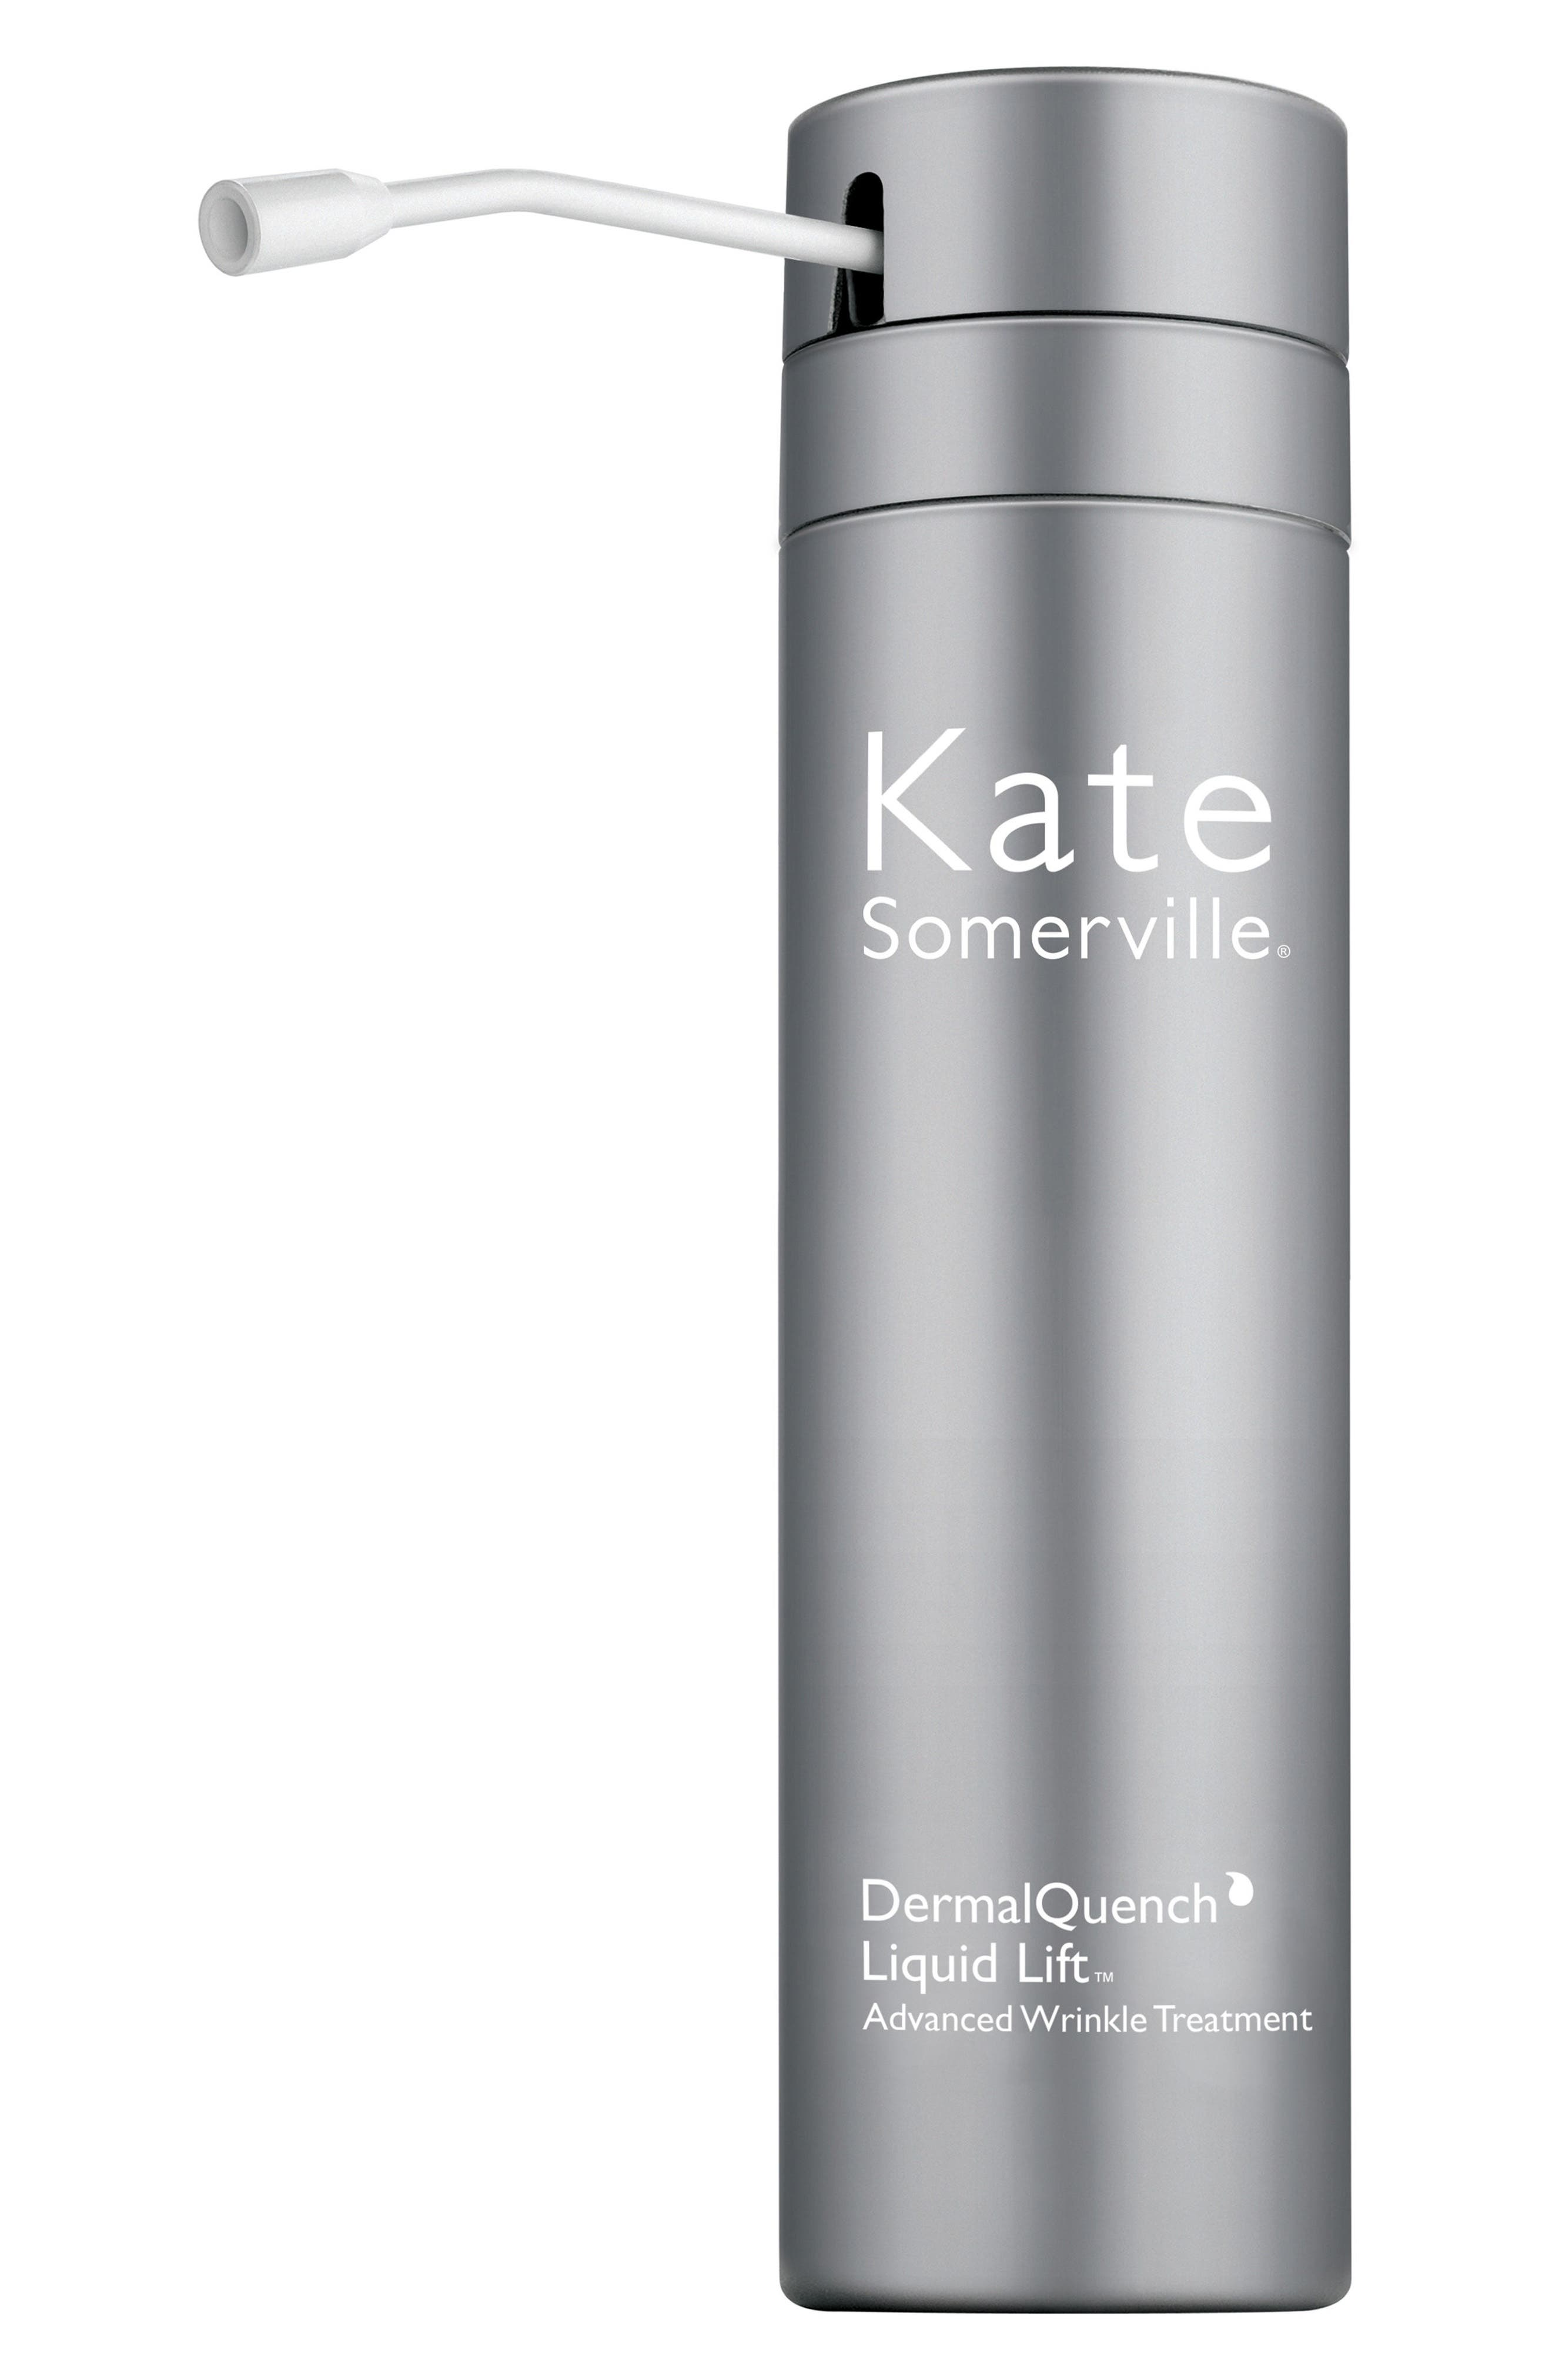 Main Image - Kate Somerville® DermalQuench Liquid Lift™ Advanced Wrinkle Treatment